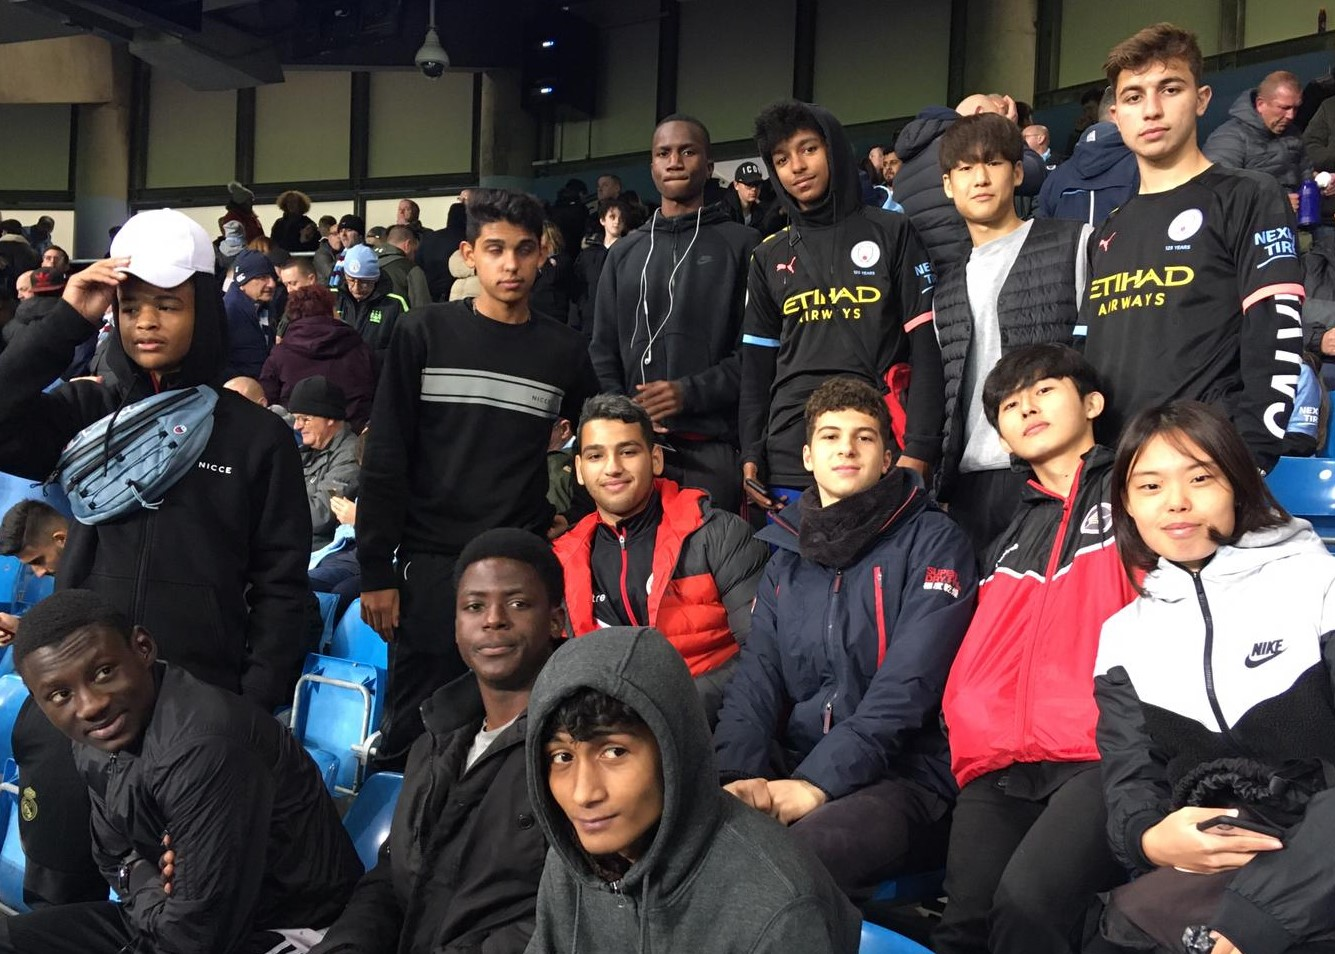 Champions League Football at the Etihad Stadium - Man City ...